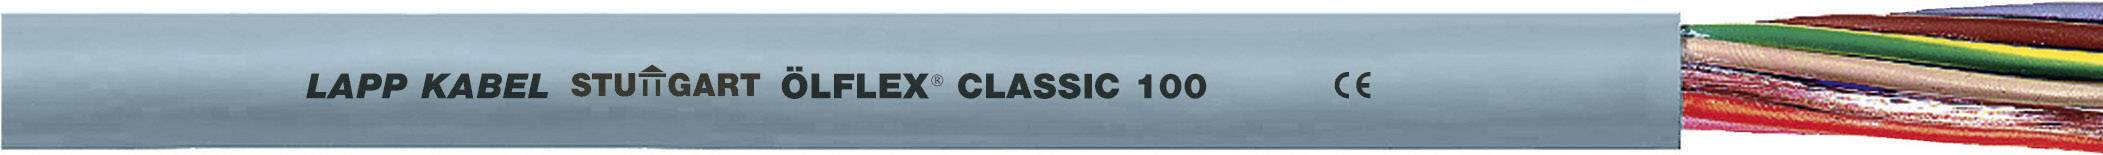 Kabel LappKabel Ölflex CLASSIC 100 5G25 (00101163), PVC, 28,5 mm, 750 V, šedá, 300 m